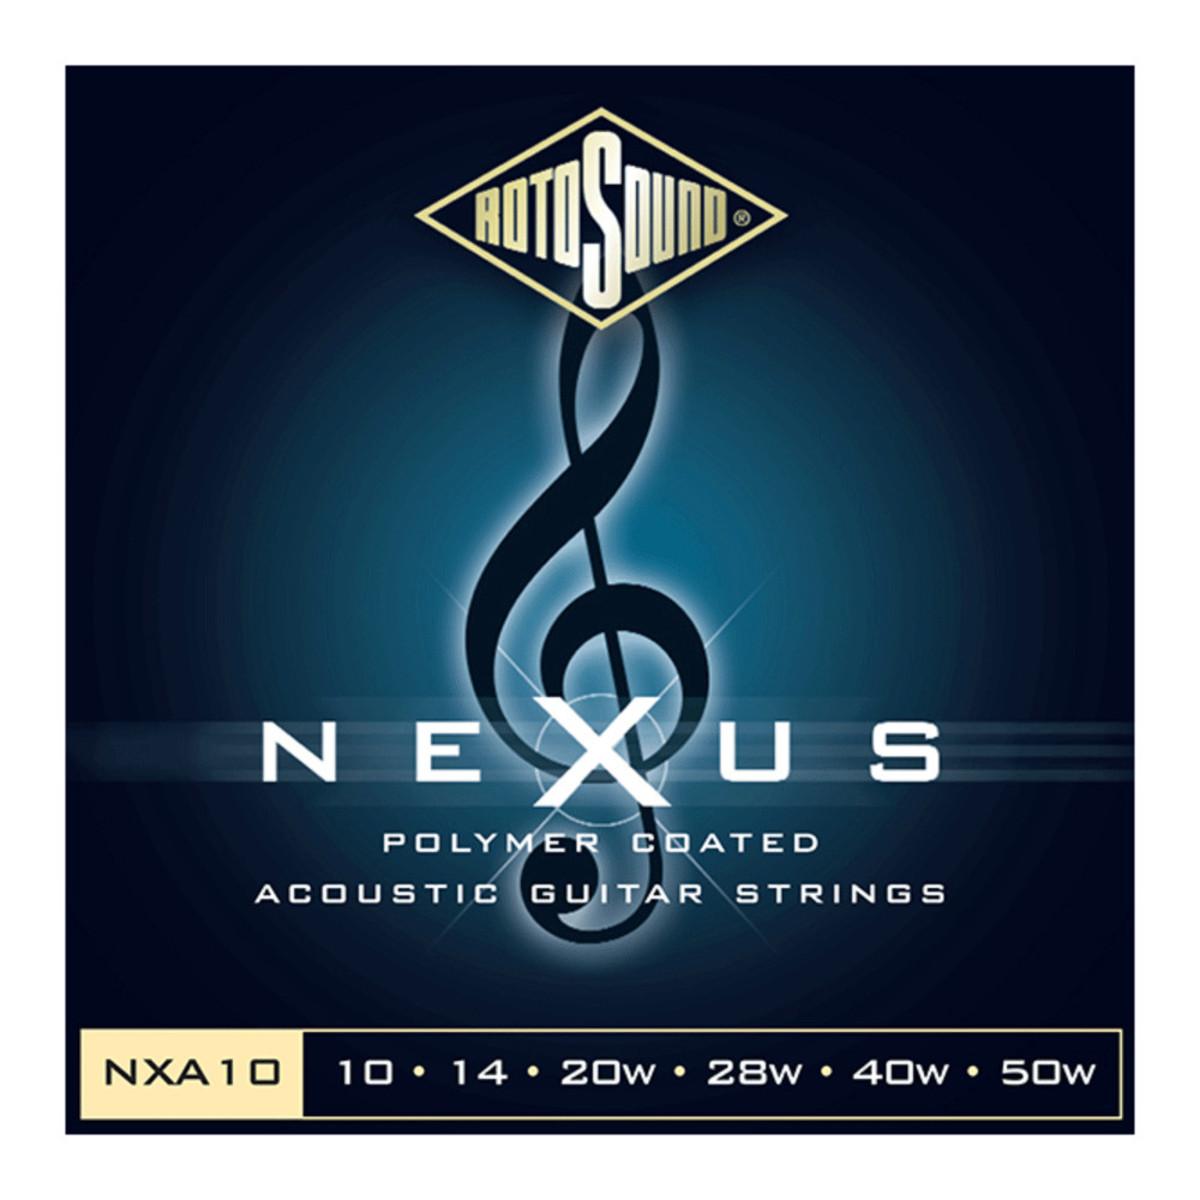 rotosound nexus coated phosphor bronze acoustic guitar strings 10 50 at. Black Bedroom Furniture Sets. Home Design Ideas